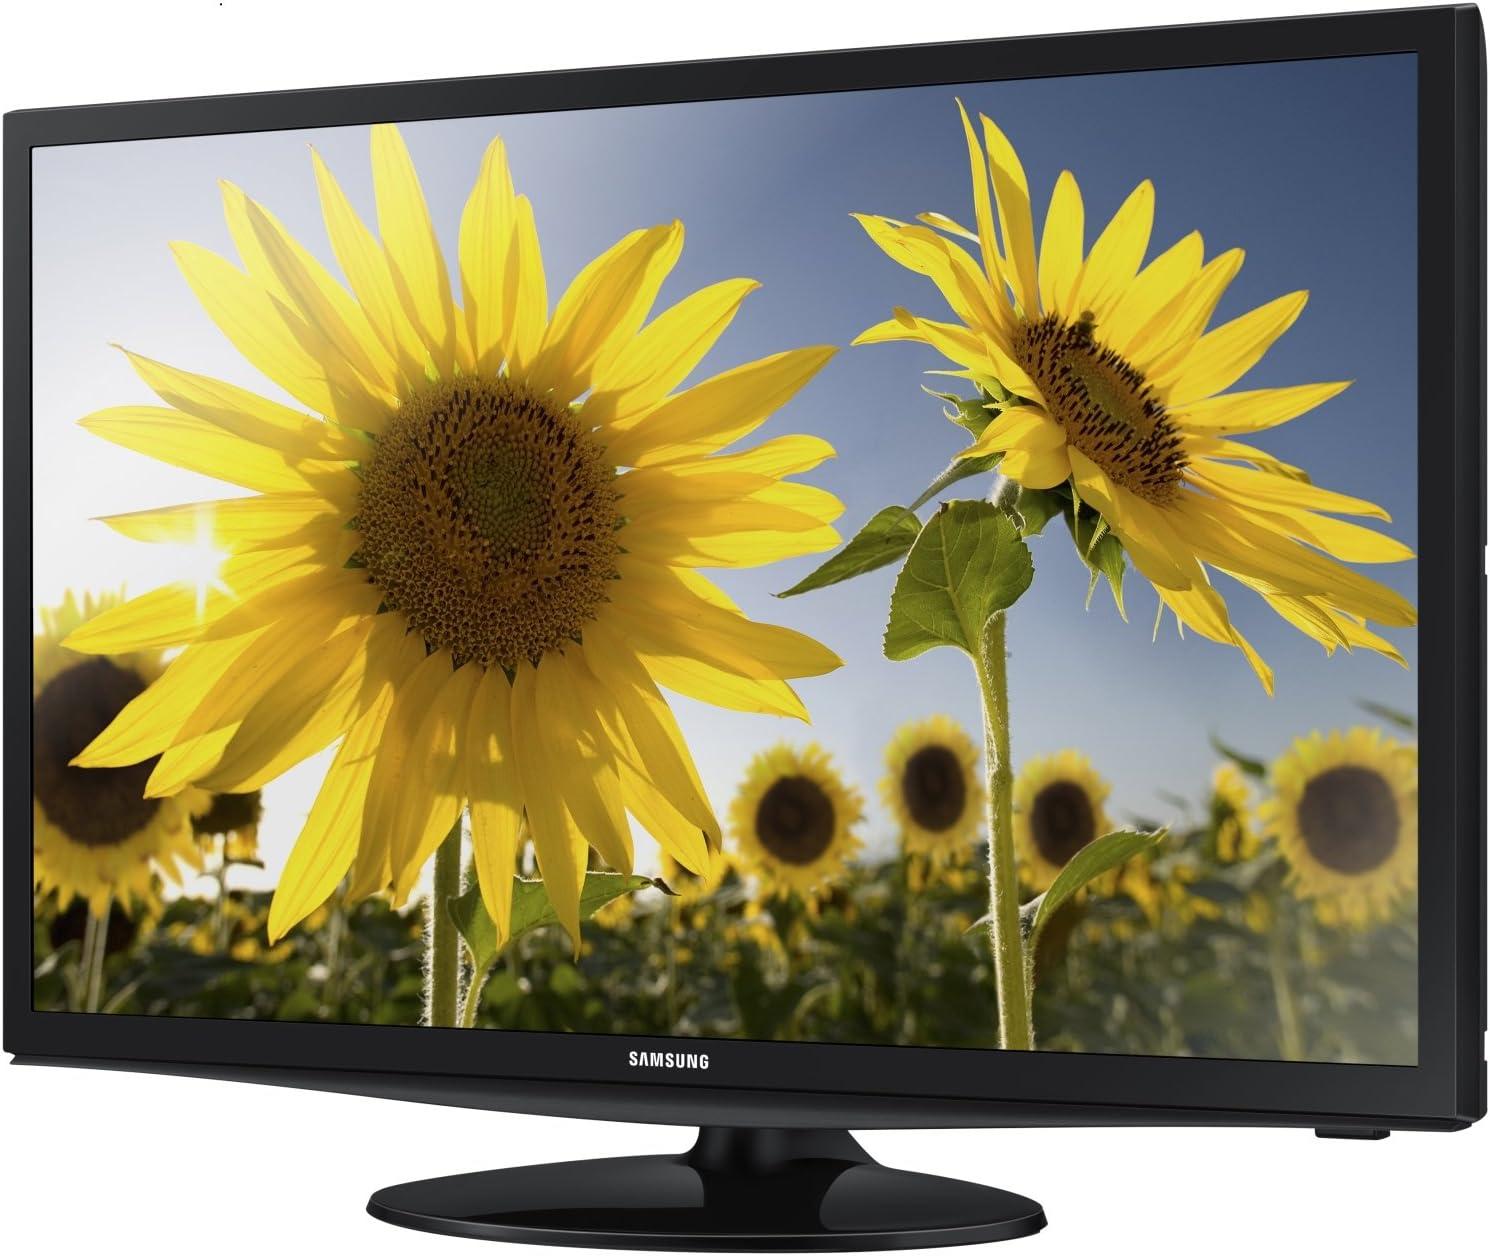 Samsung LT28D310EW - Televisor de 27.5